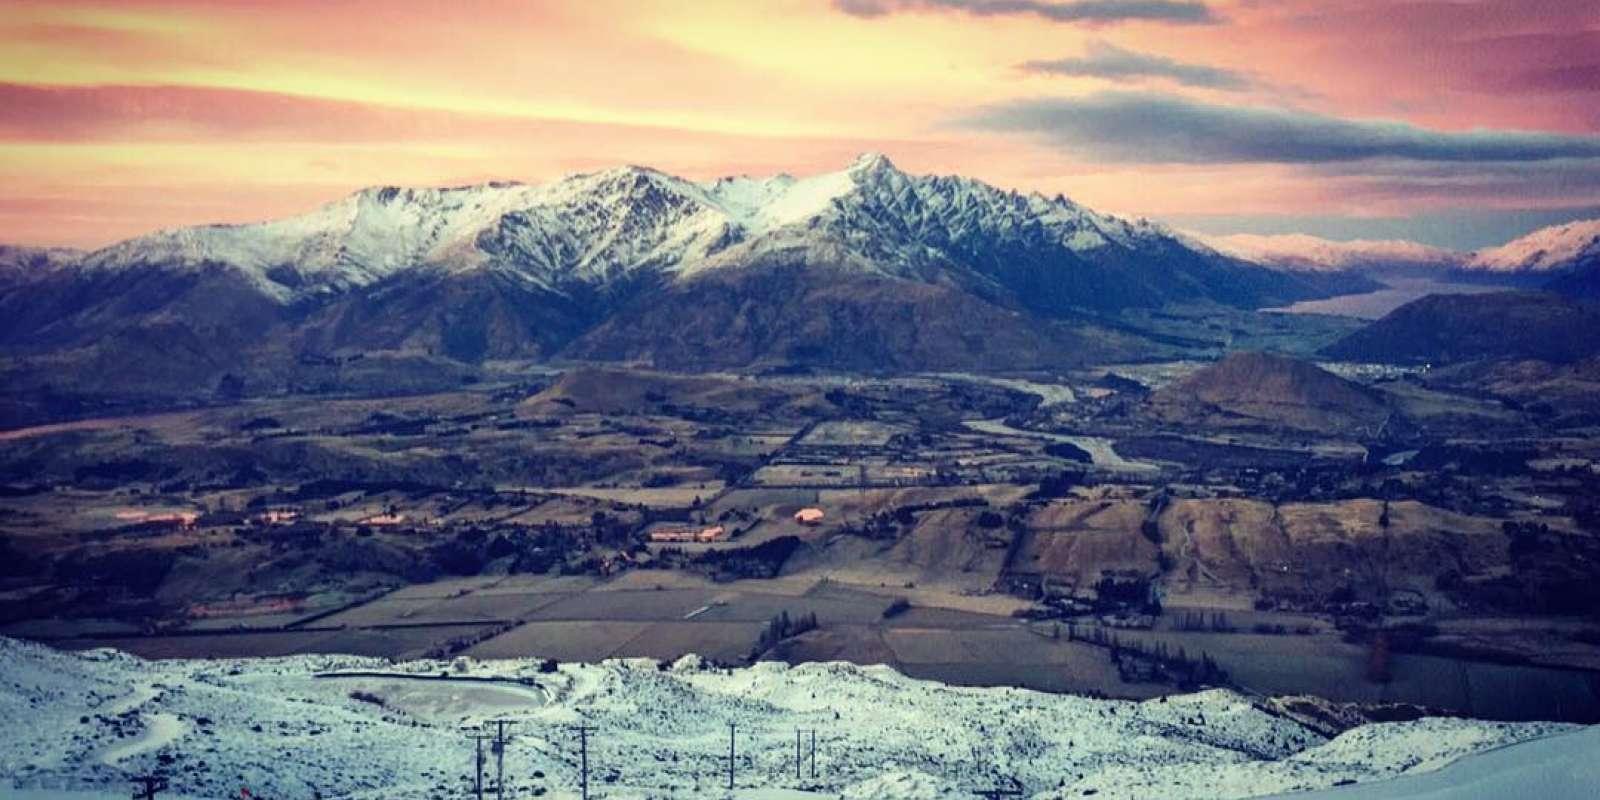 Sunset from Coronet Peak